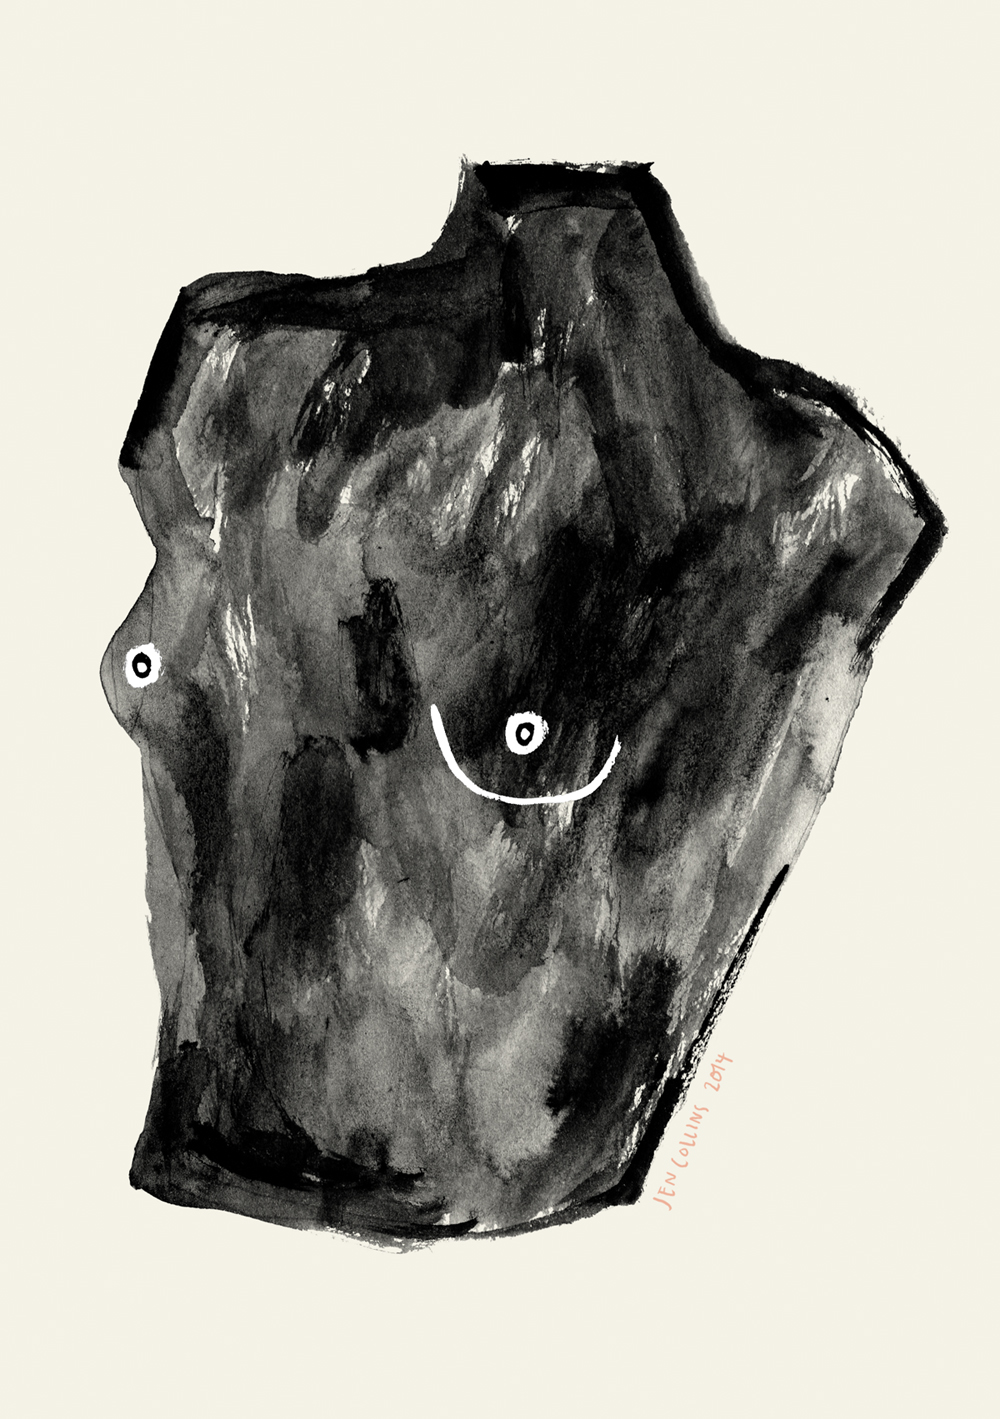 Torso illustration